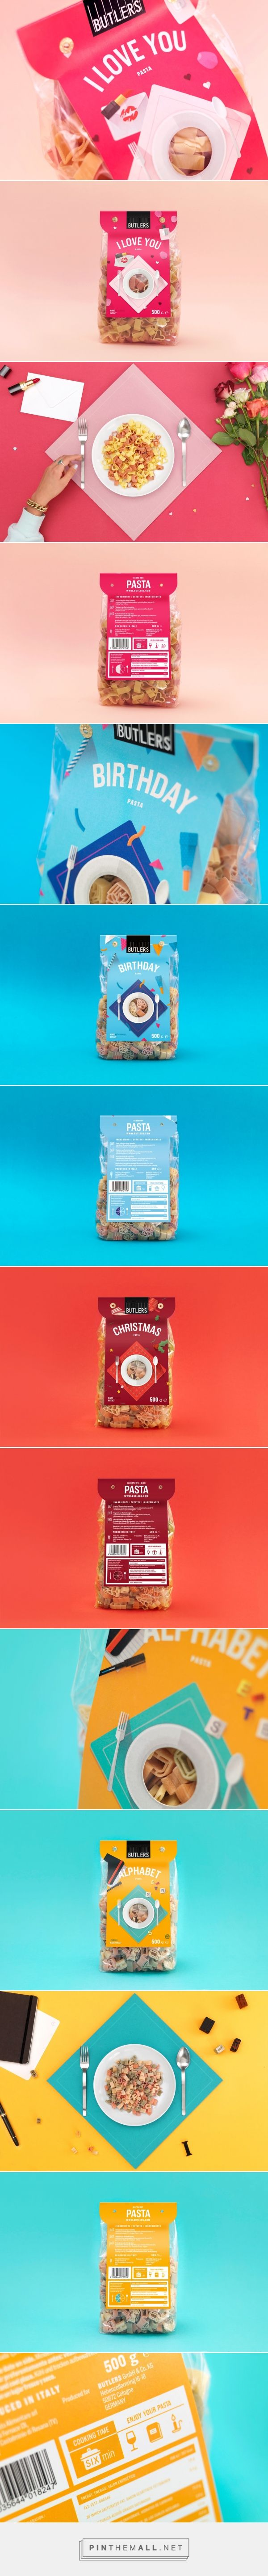 Butlers Pasta packaging design by STUDIO CHAPEAUX - http://www.packagingoftheworld.com/2016/11/butlers-pasta.html